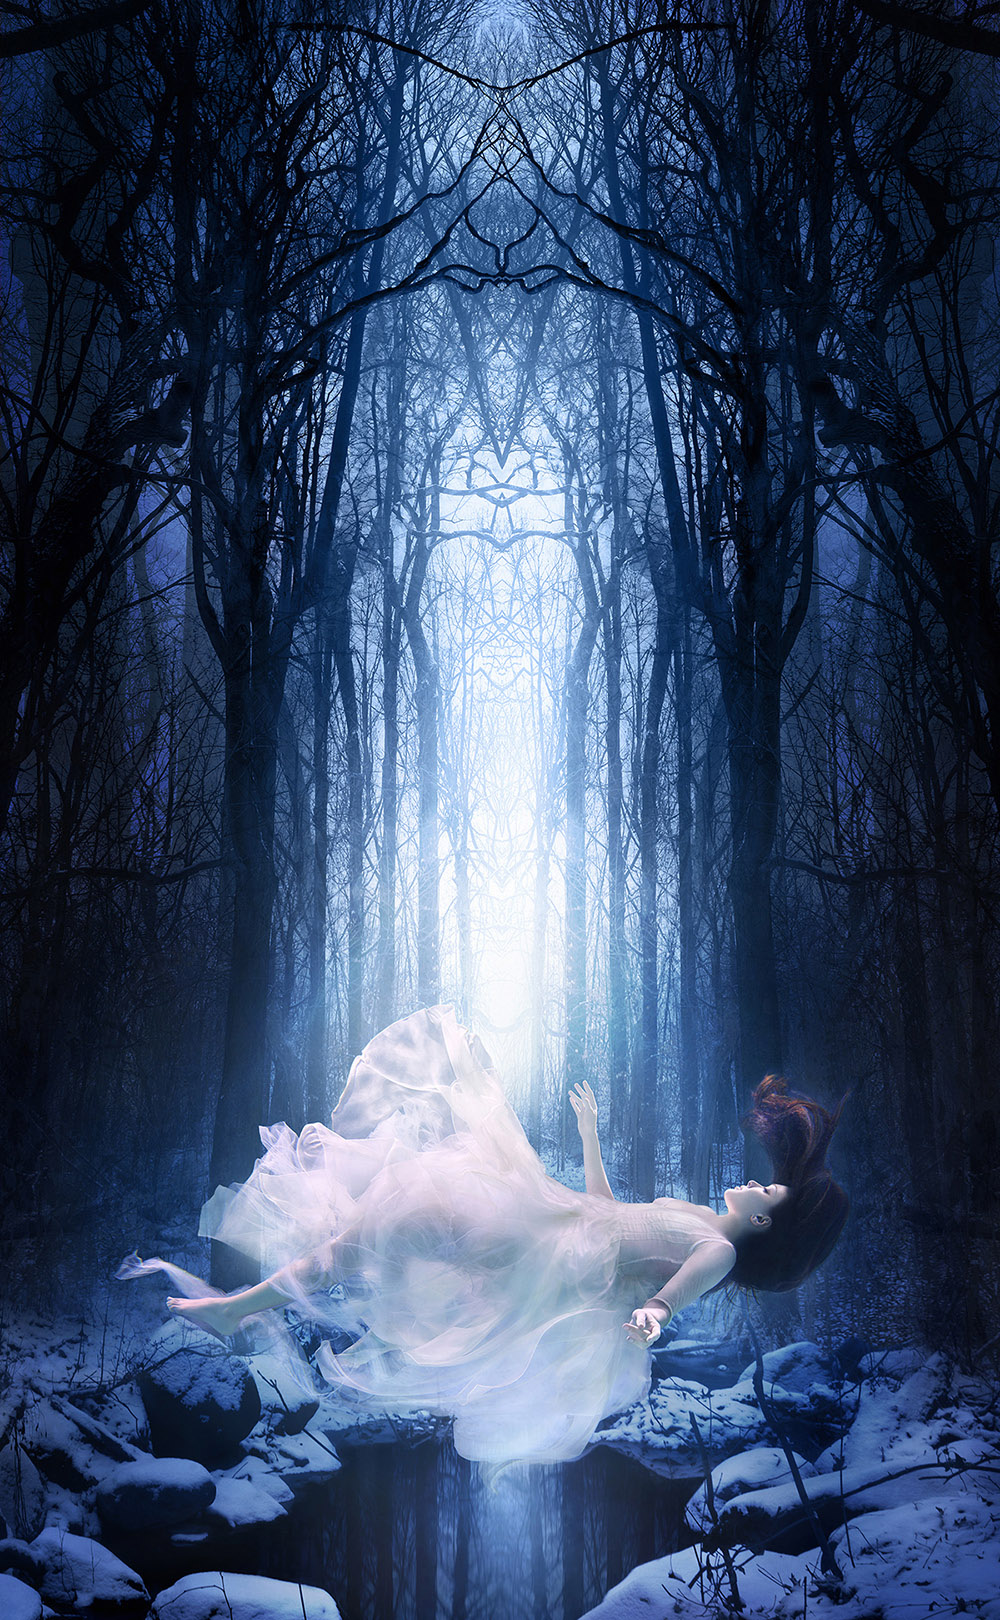 Snowdrop | Michael David